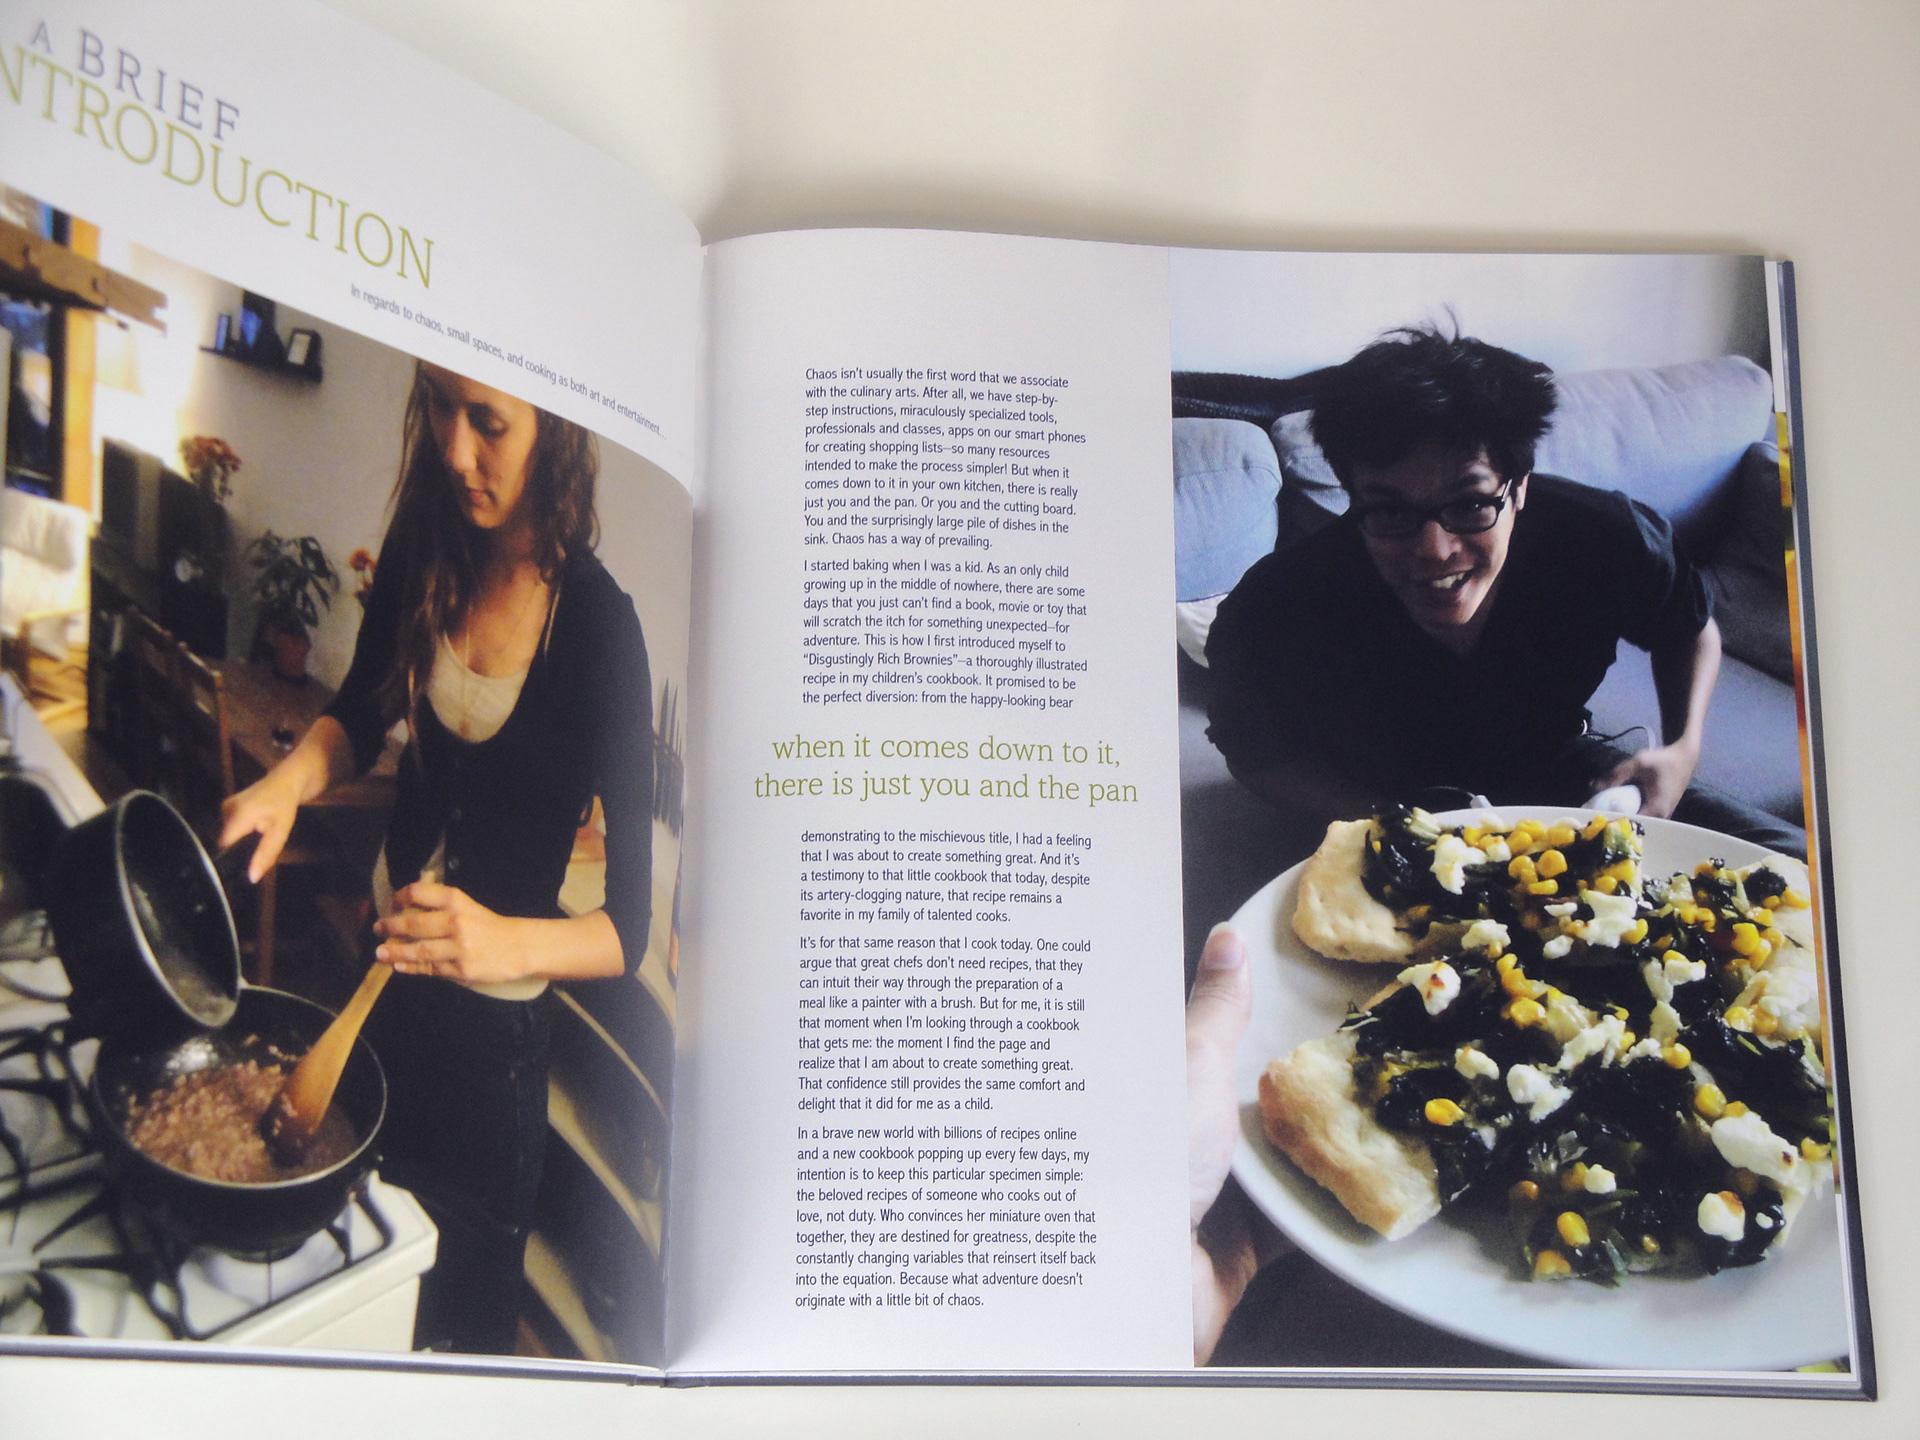 Nicolette hayes manhattan recipes an urban cookbook introduction solutioingenieria Images